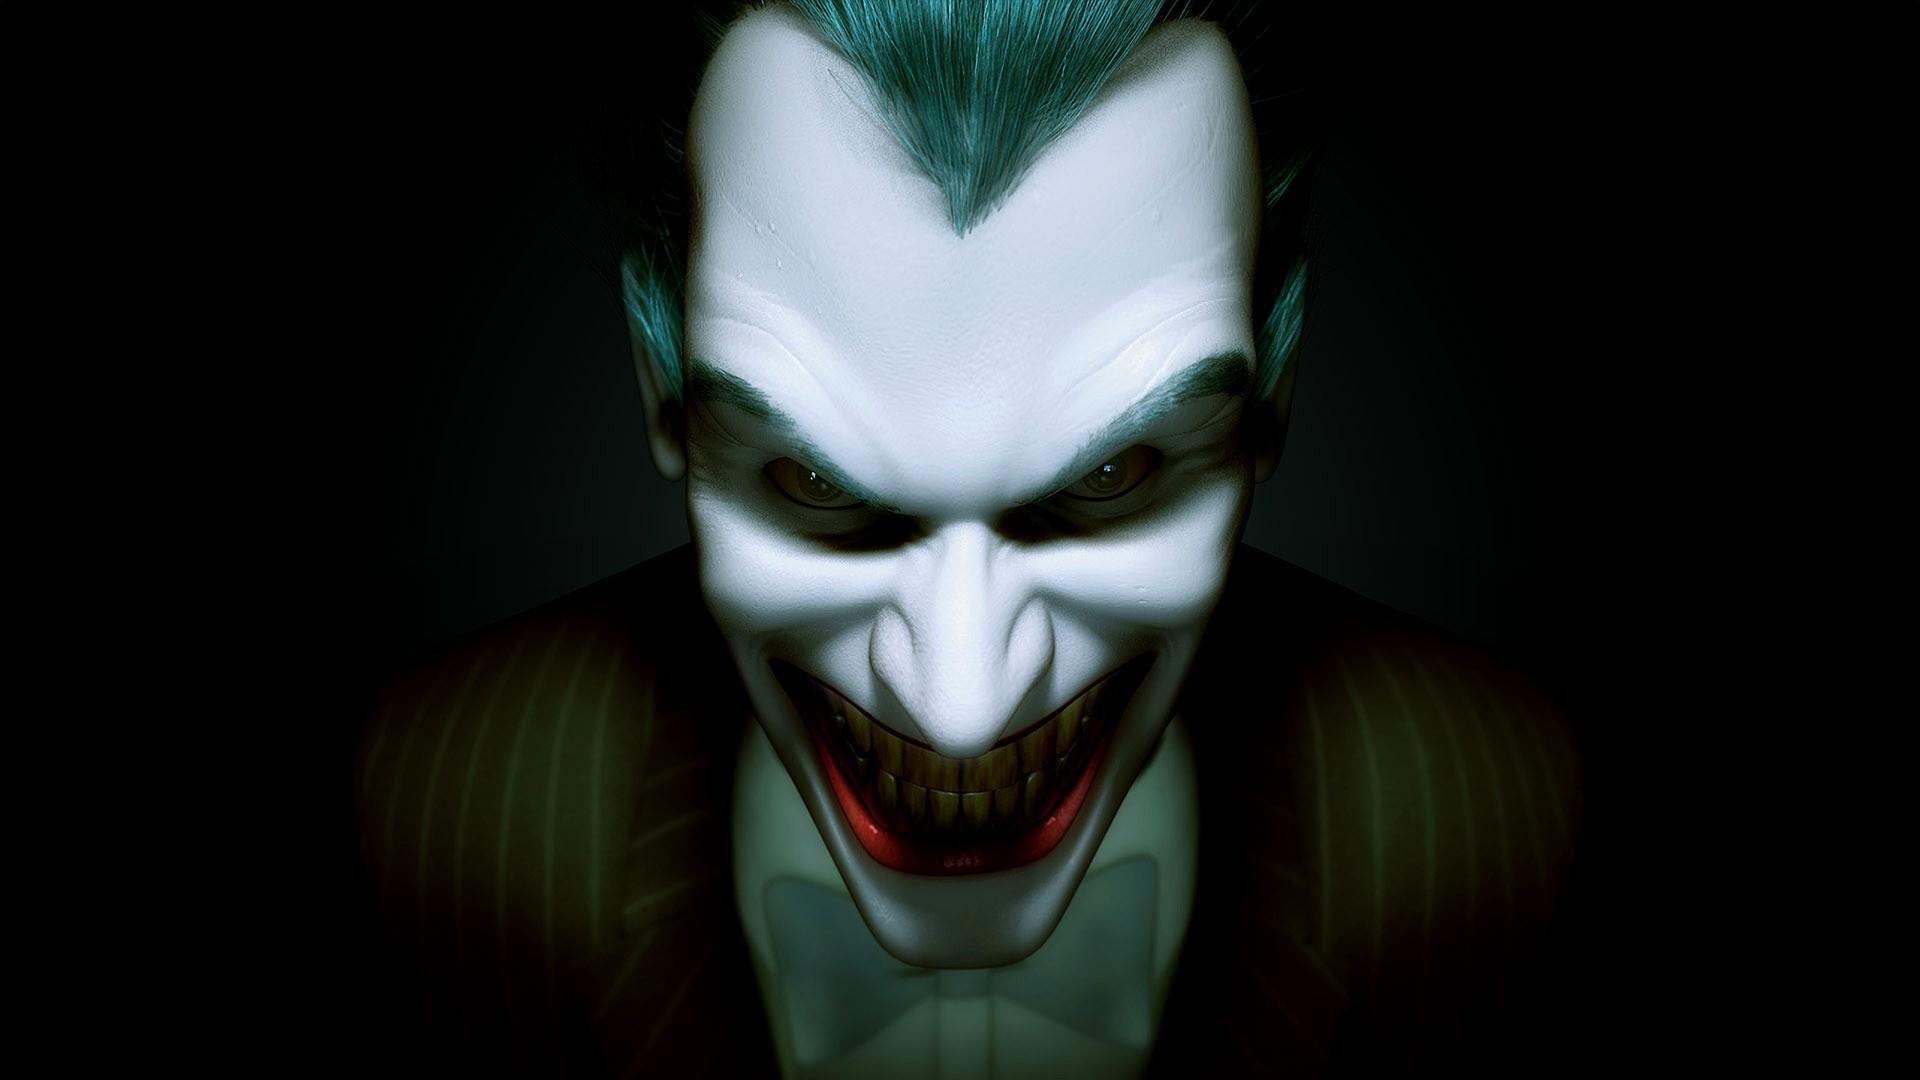 Joker Face Wallpaper Credited